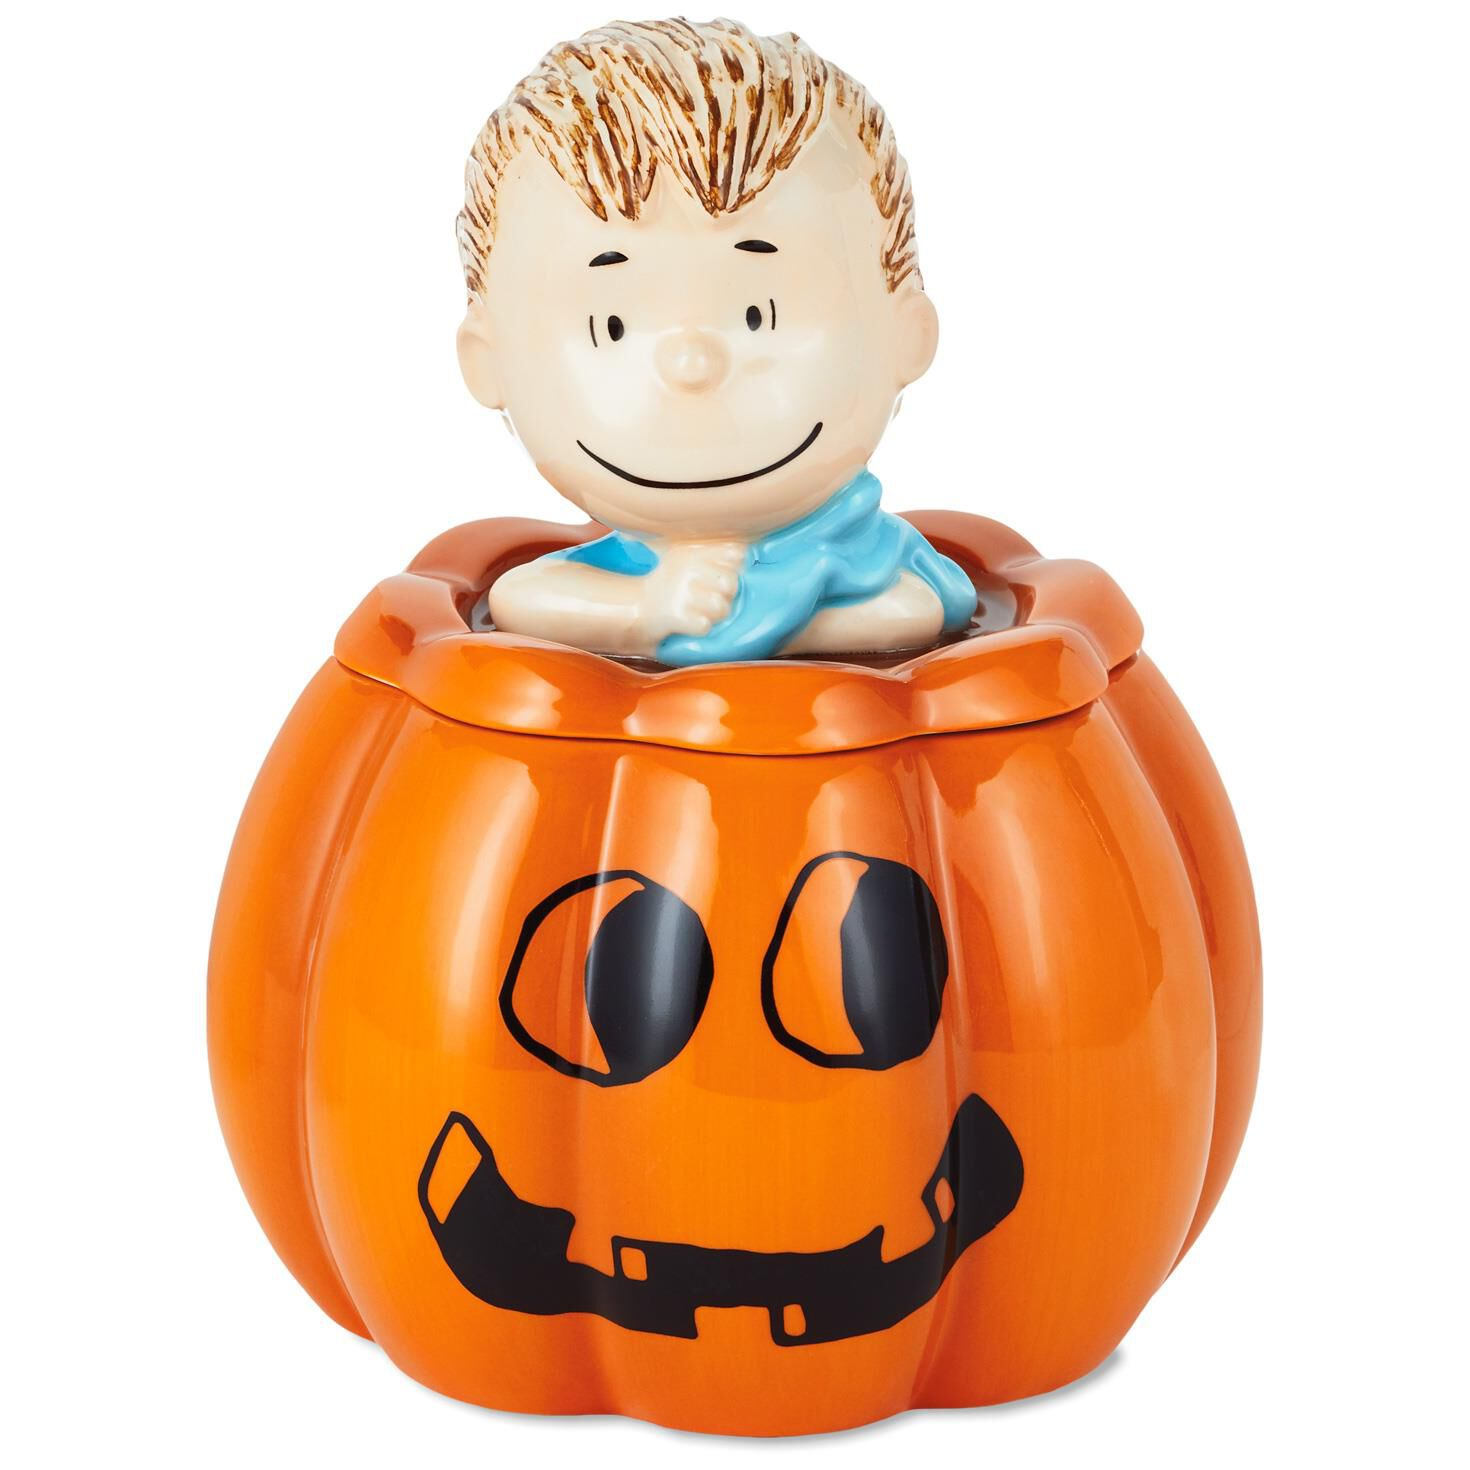 graphic about Peanuts Pumpkin Printable Carving Patterns named Peanuts Pumpkin Carving Hallmark Recommendations Motivation